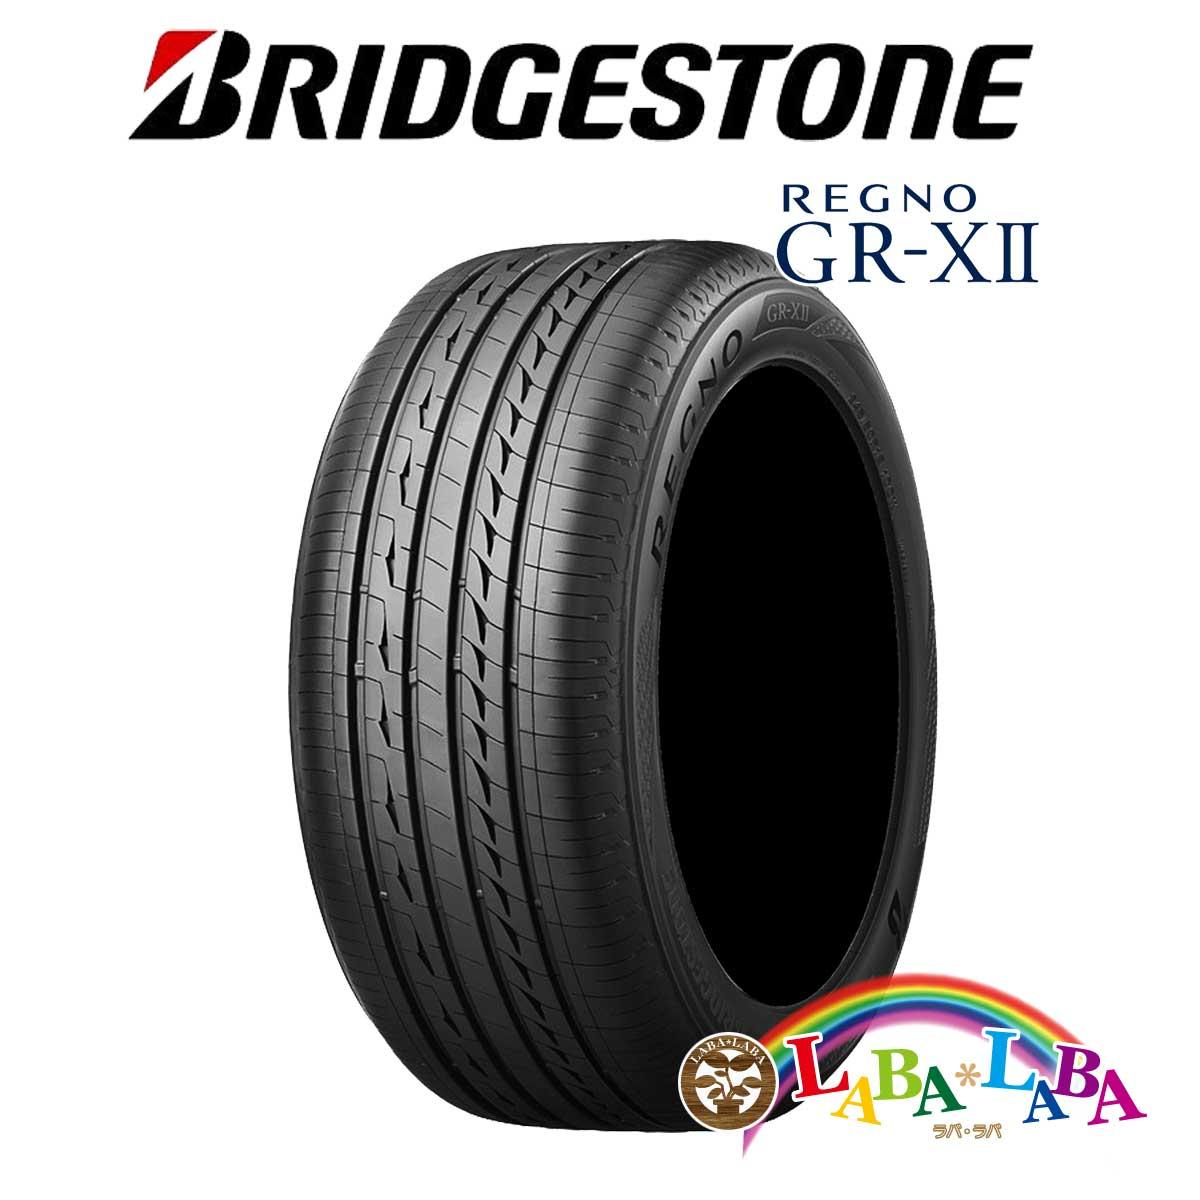 BRIDGESTONE ブリヂストン REGNO レグノ GR-X2 (GRX2) 225/45R17 91W サマータイヤ